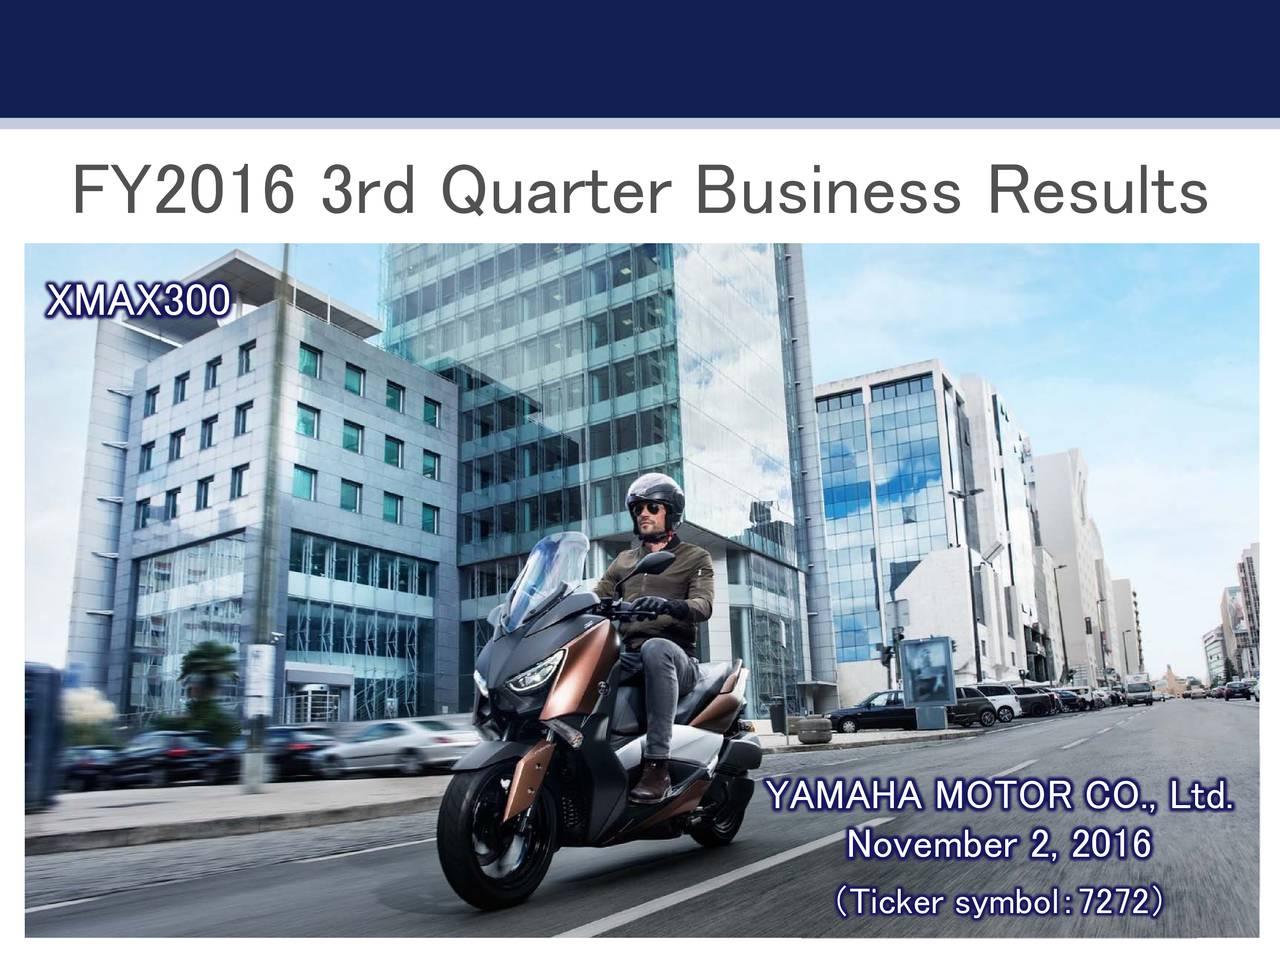 hight resolution of yamaha motor co ltd adr 2016 q3 results earnings call slides